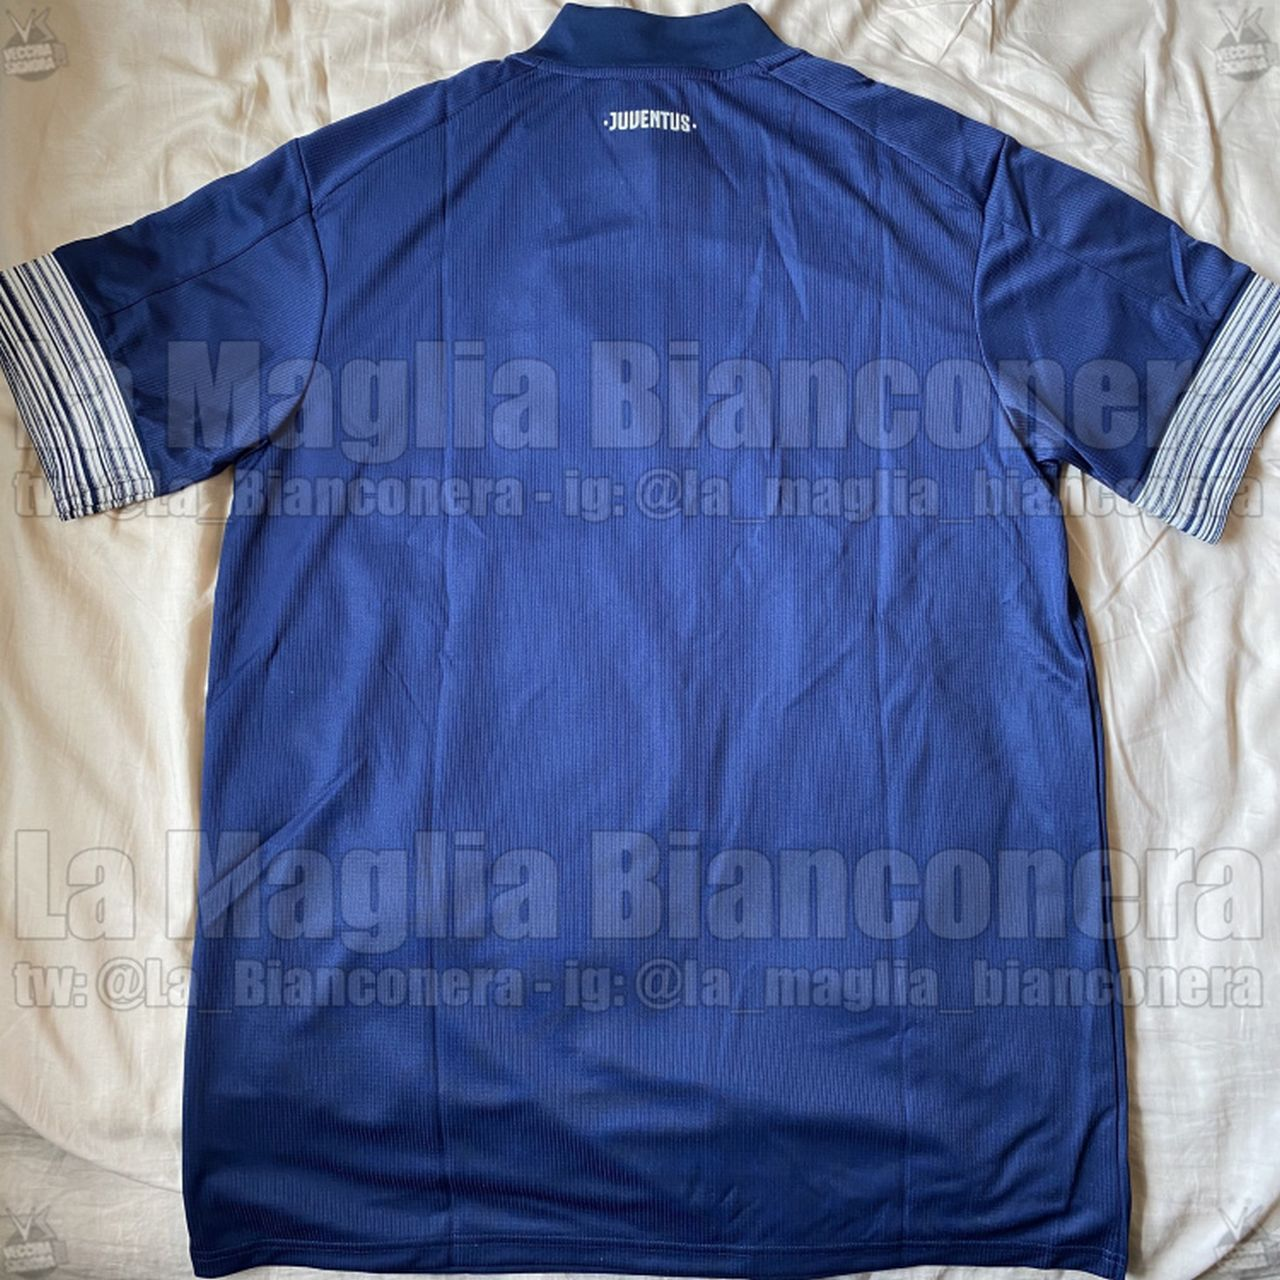 maglia away juventus 2020-2021 retro